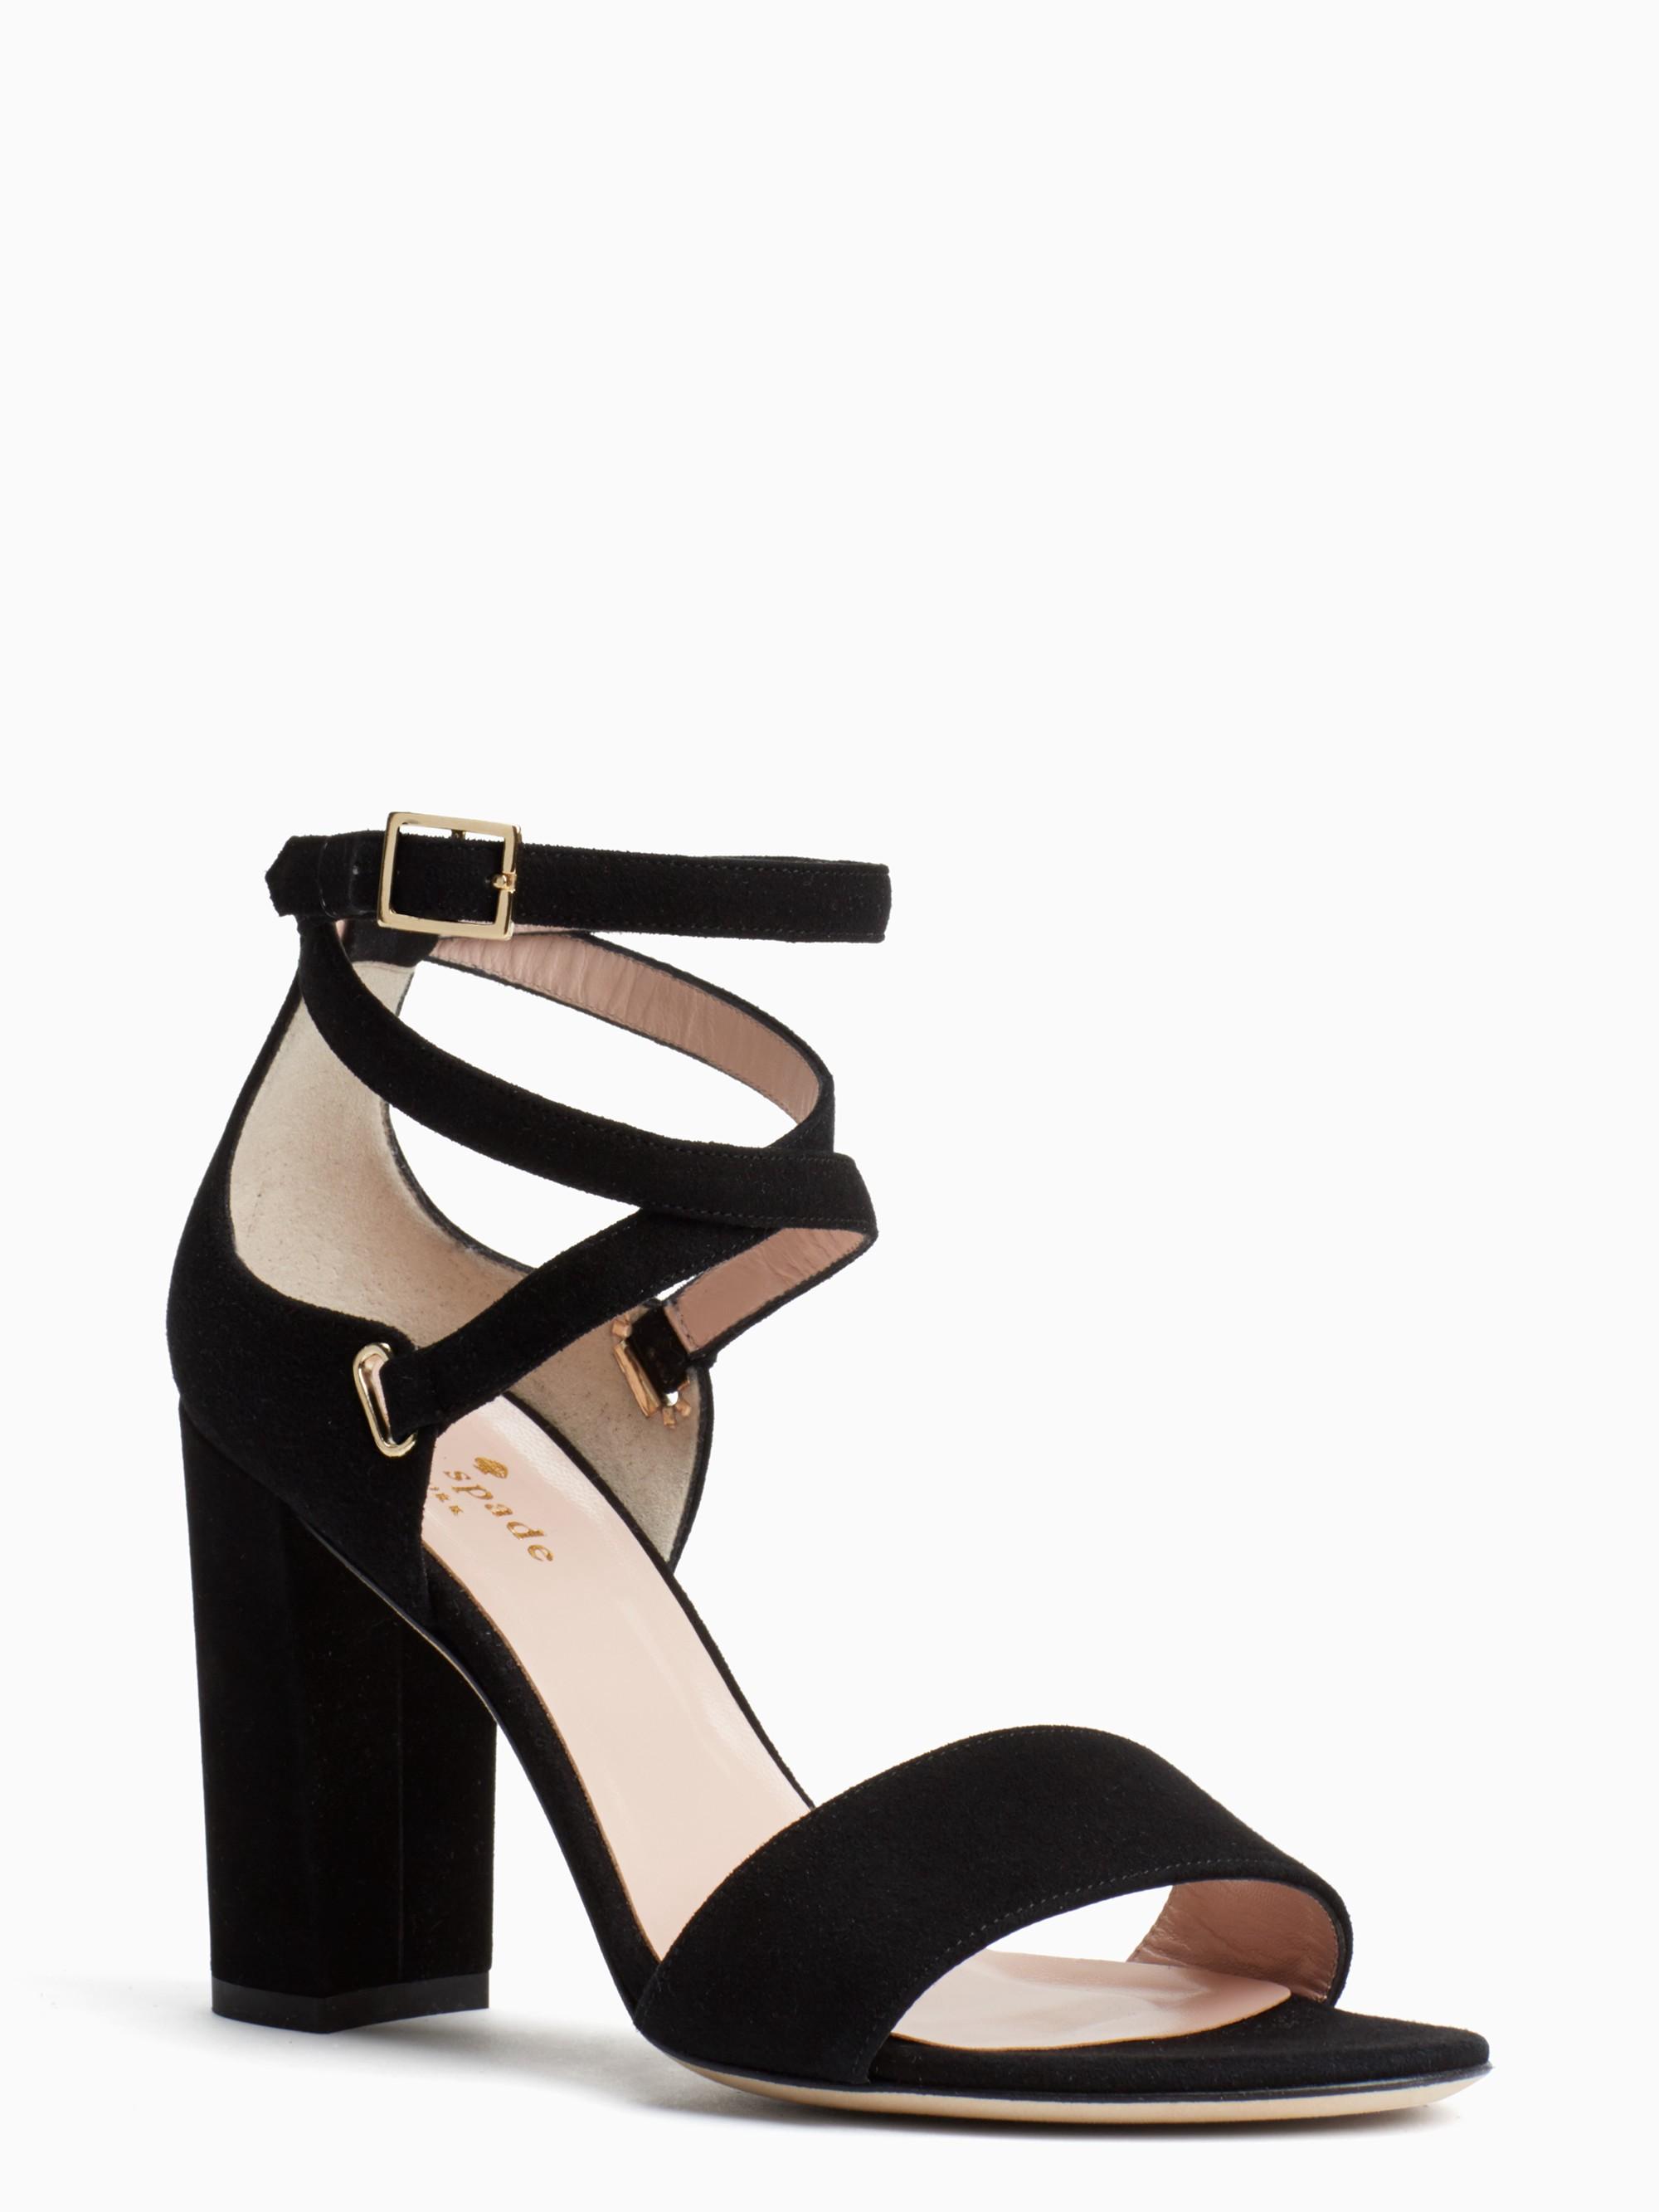 Kate Spade Isolde Sandal In Black